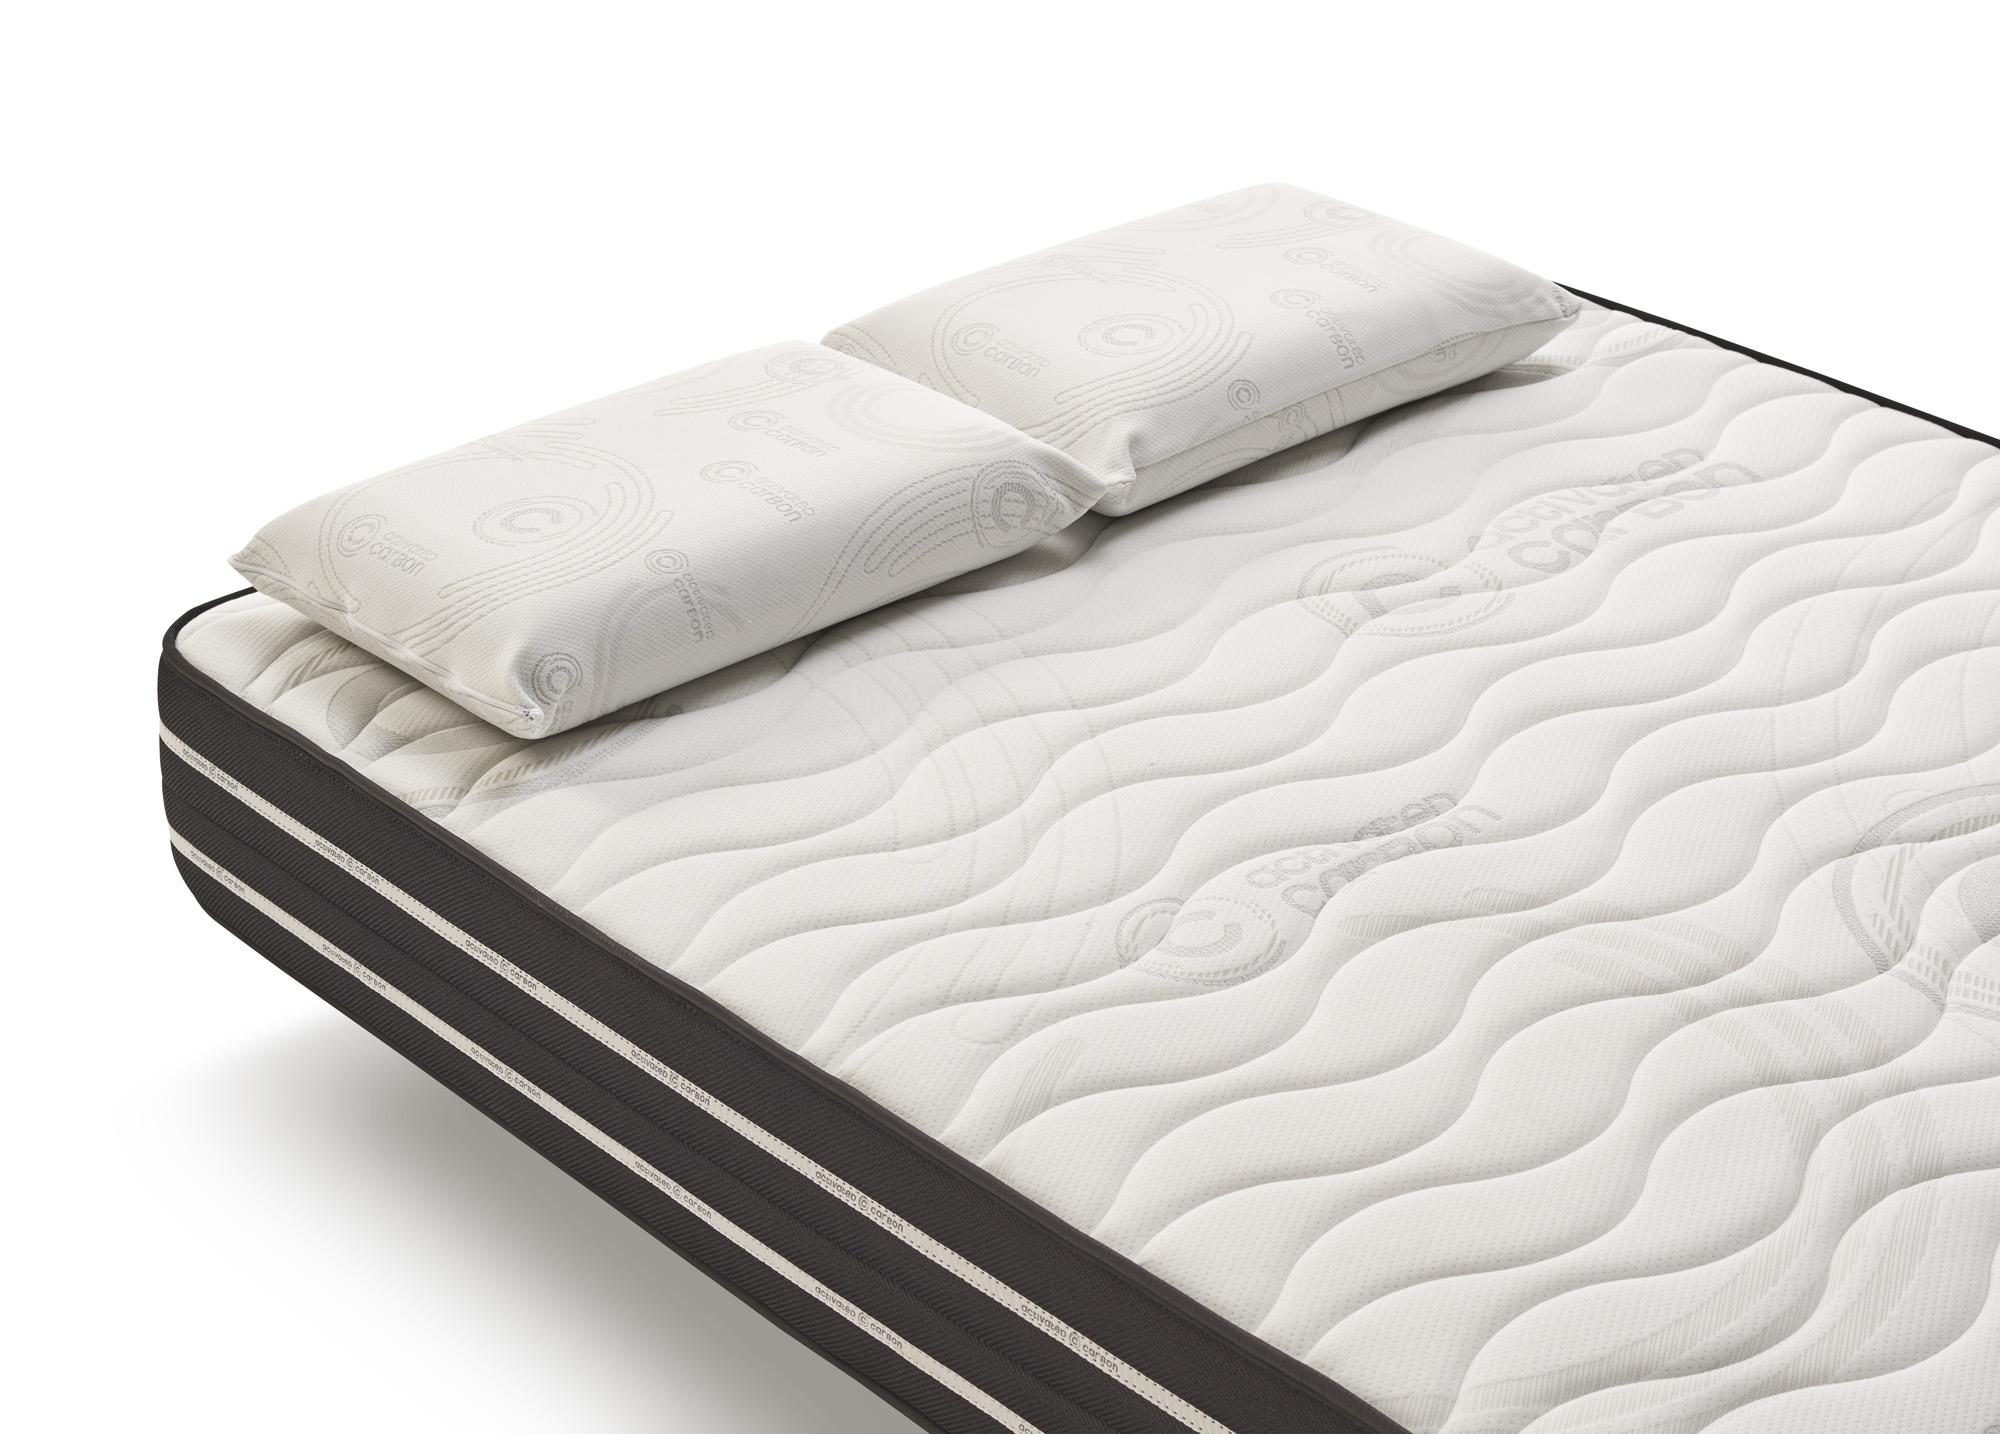 matelas activated carbon cosmos aux particules de carbone. Black Bedroom Furniture Sets. Home Design Ideas